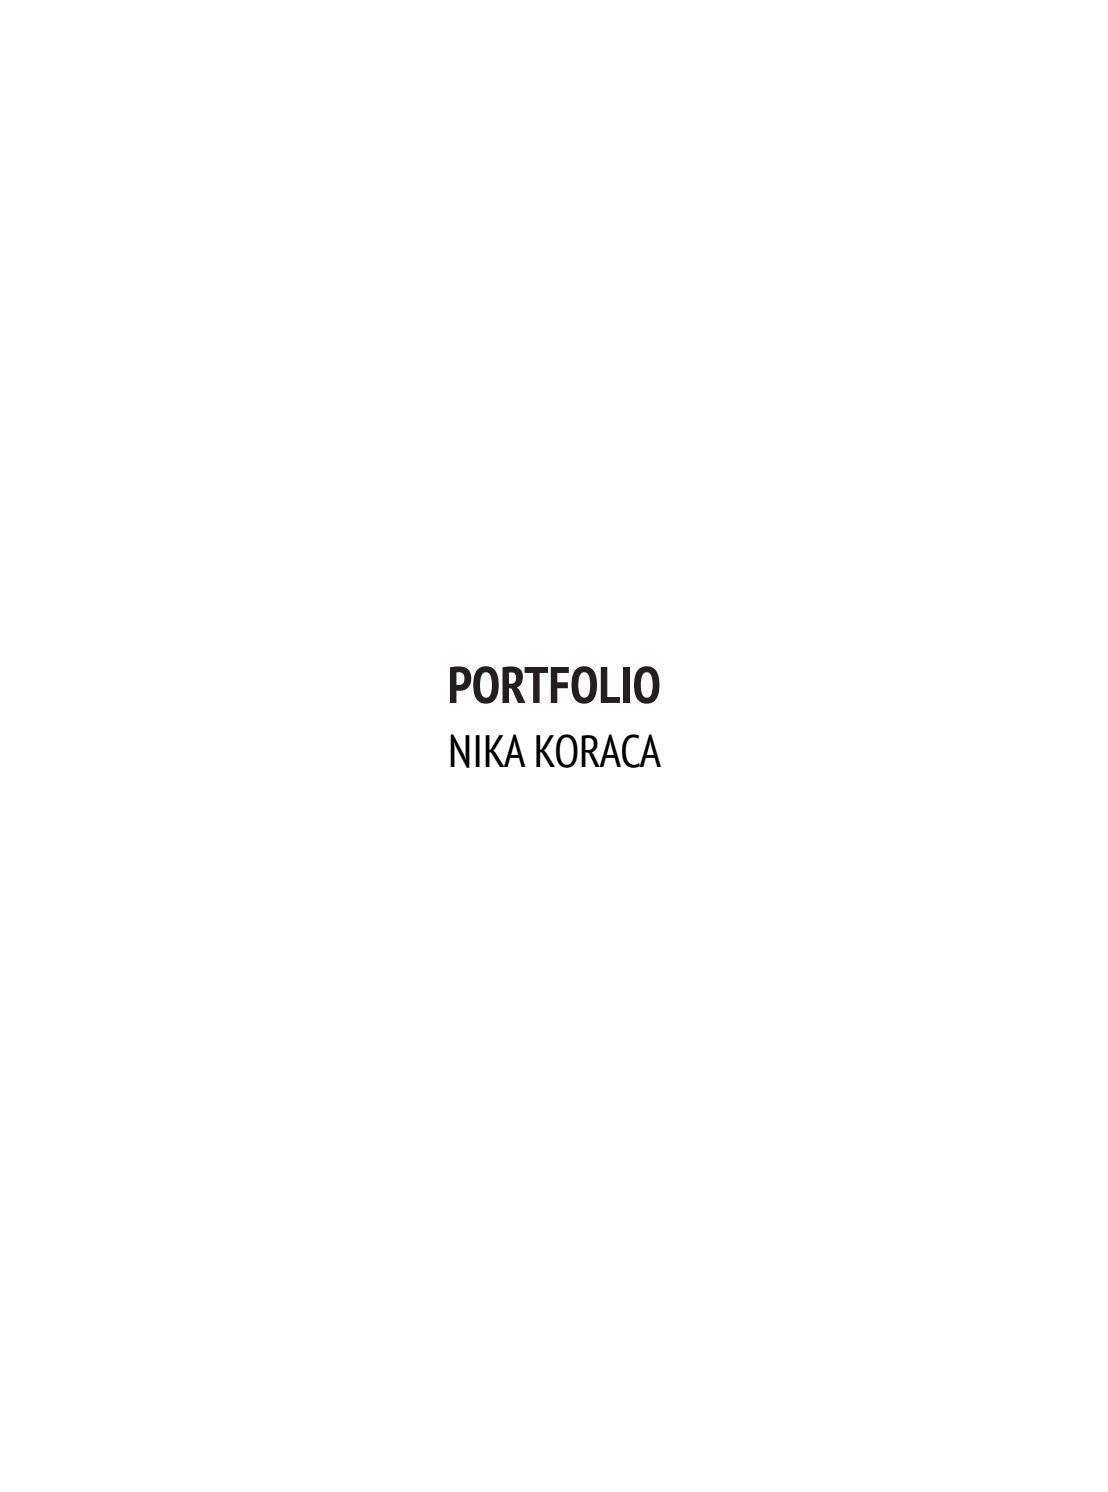 Retrato Humano marxismo  Architecture Portfolio 2017 by nika koraca - issuu